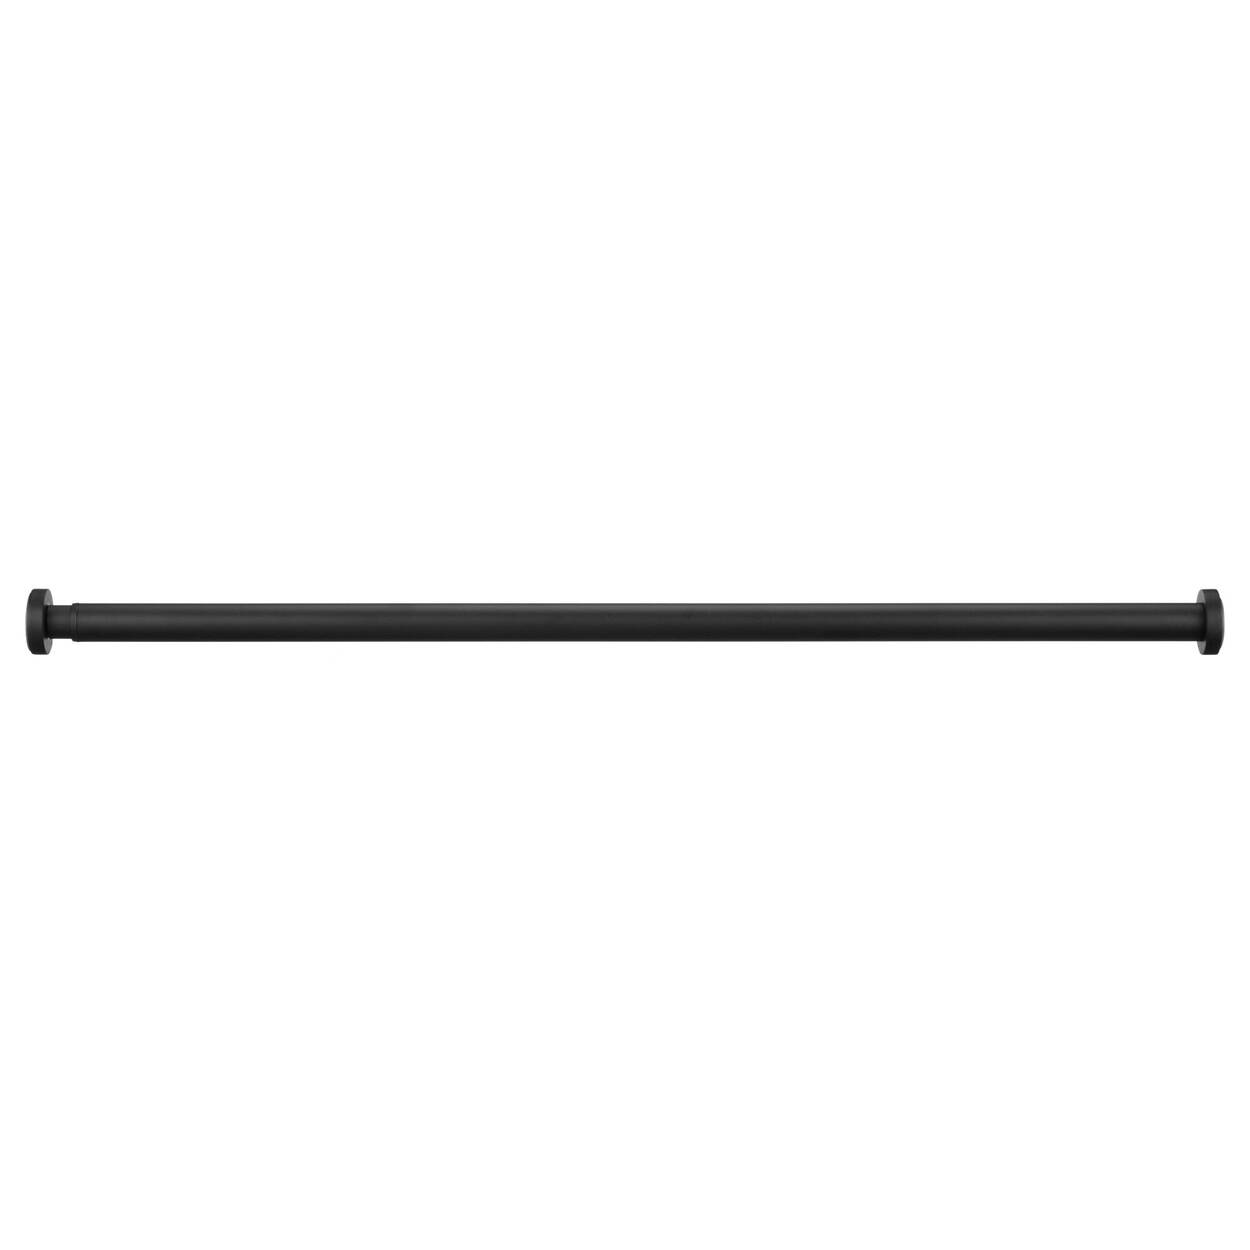 Curtain Tension Rod - Diameter 22/25 mm